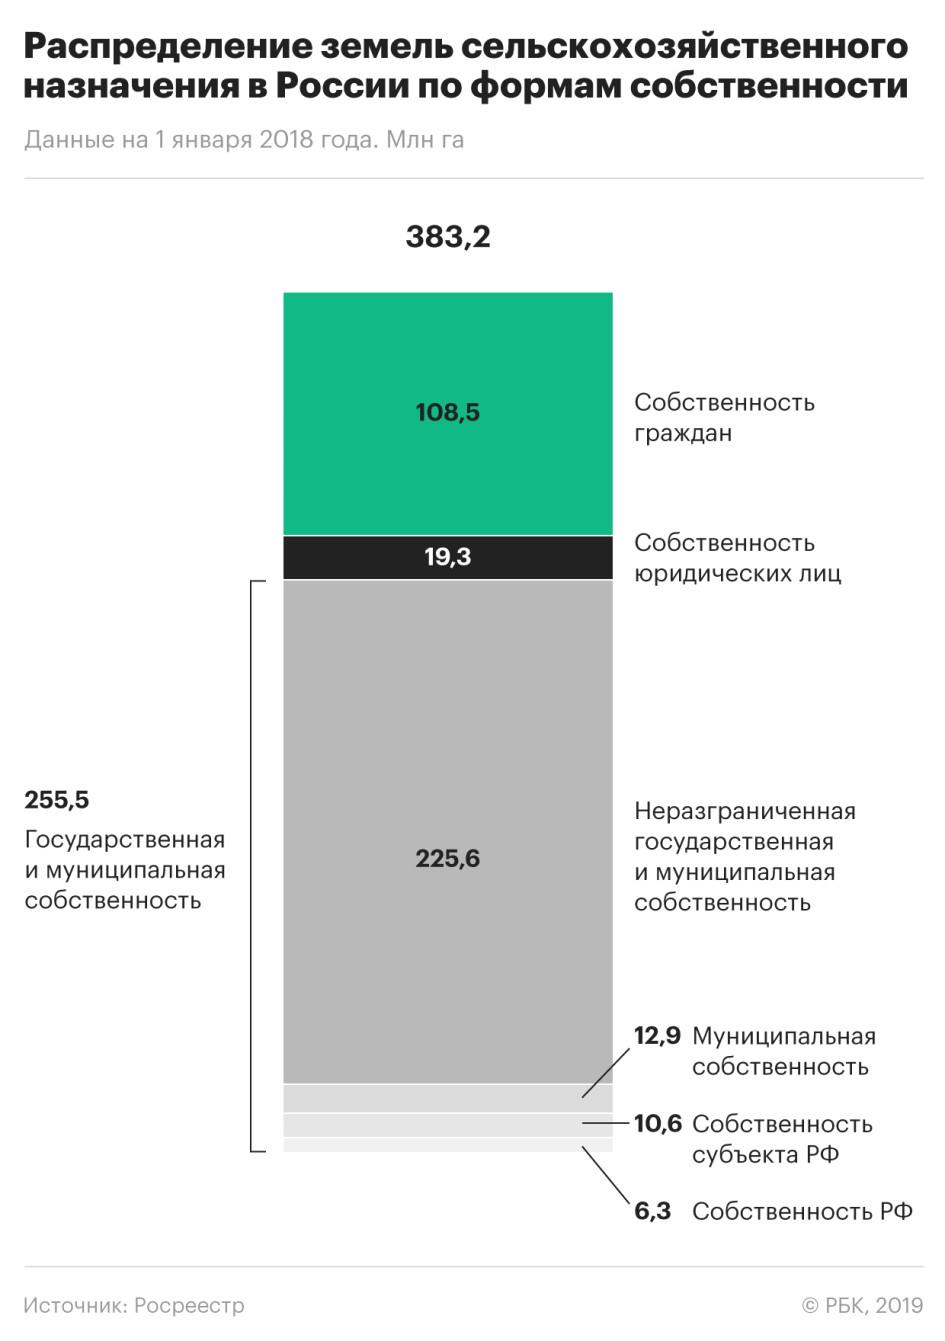 https://s0.rbk.ru/v6_top_pics/resized/945xH/media/img/4/53/755706479192534.jpeg